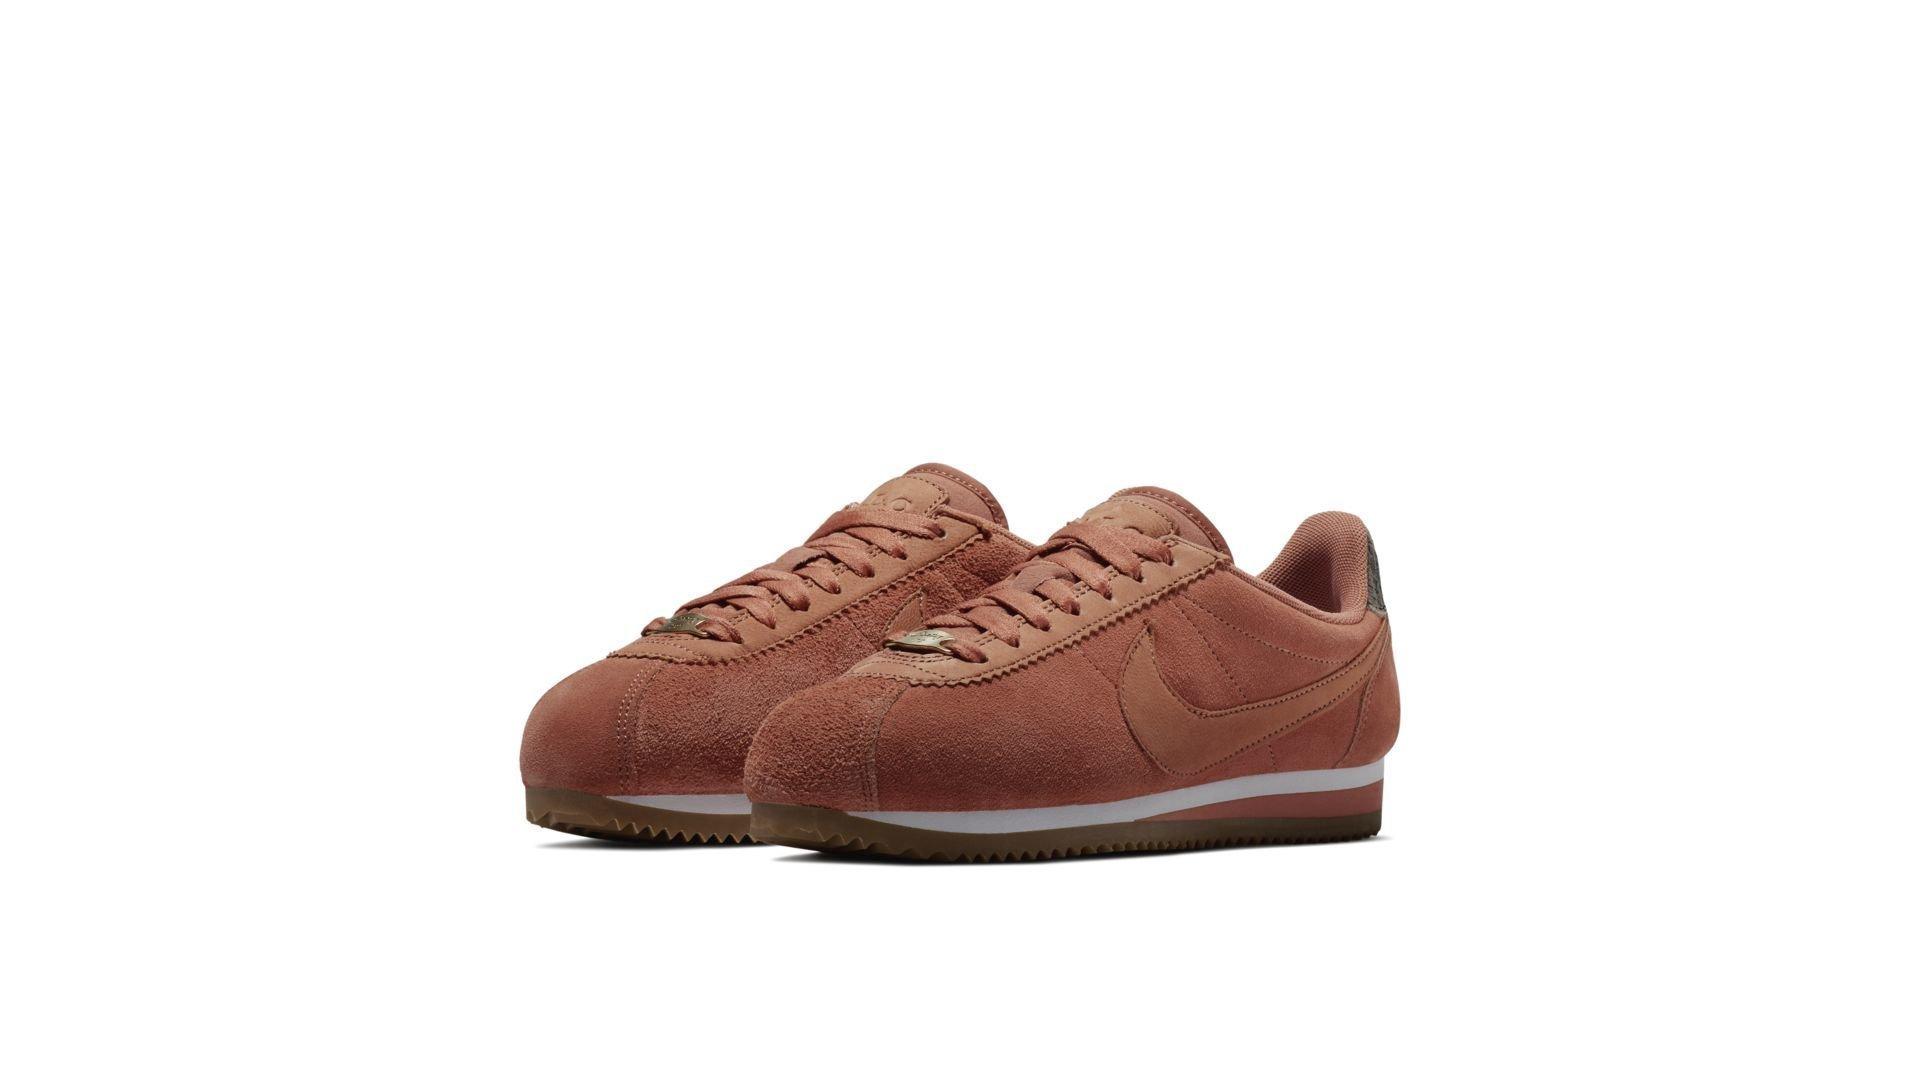 Nike Classic Cortez ALC Terra Blush (W) (AH5206-200)